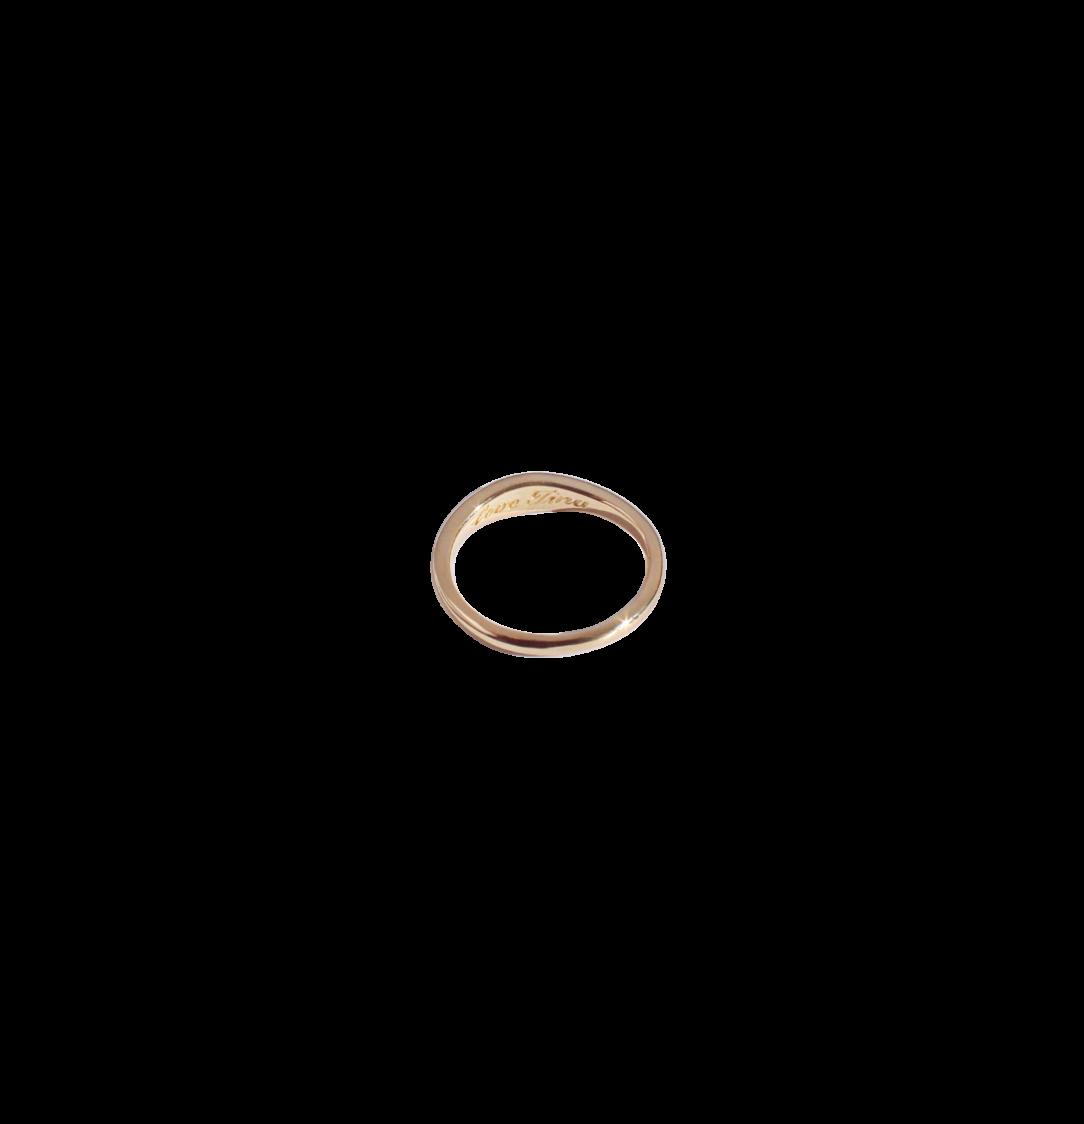 Ring von Tina Turner